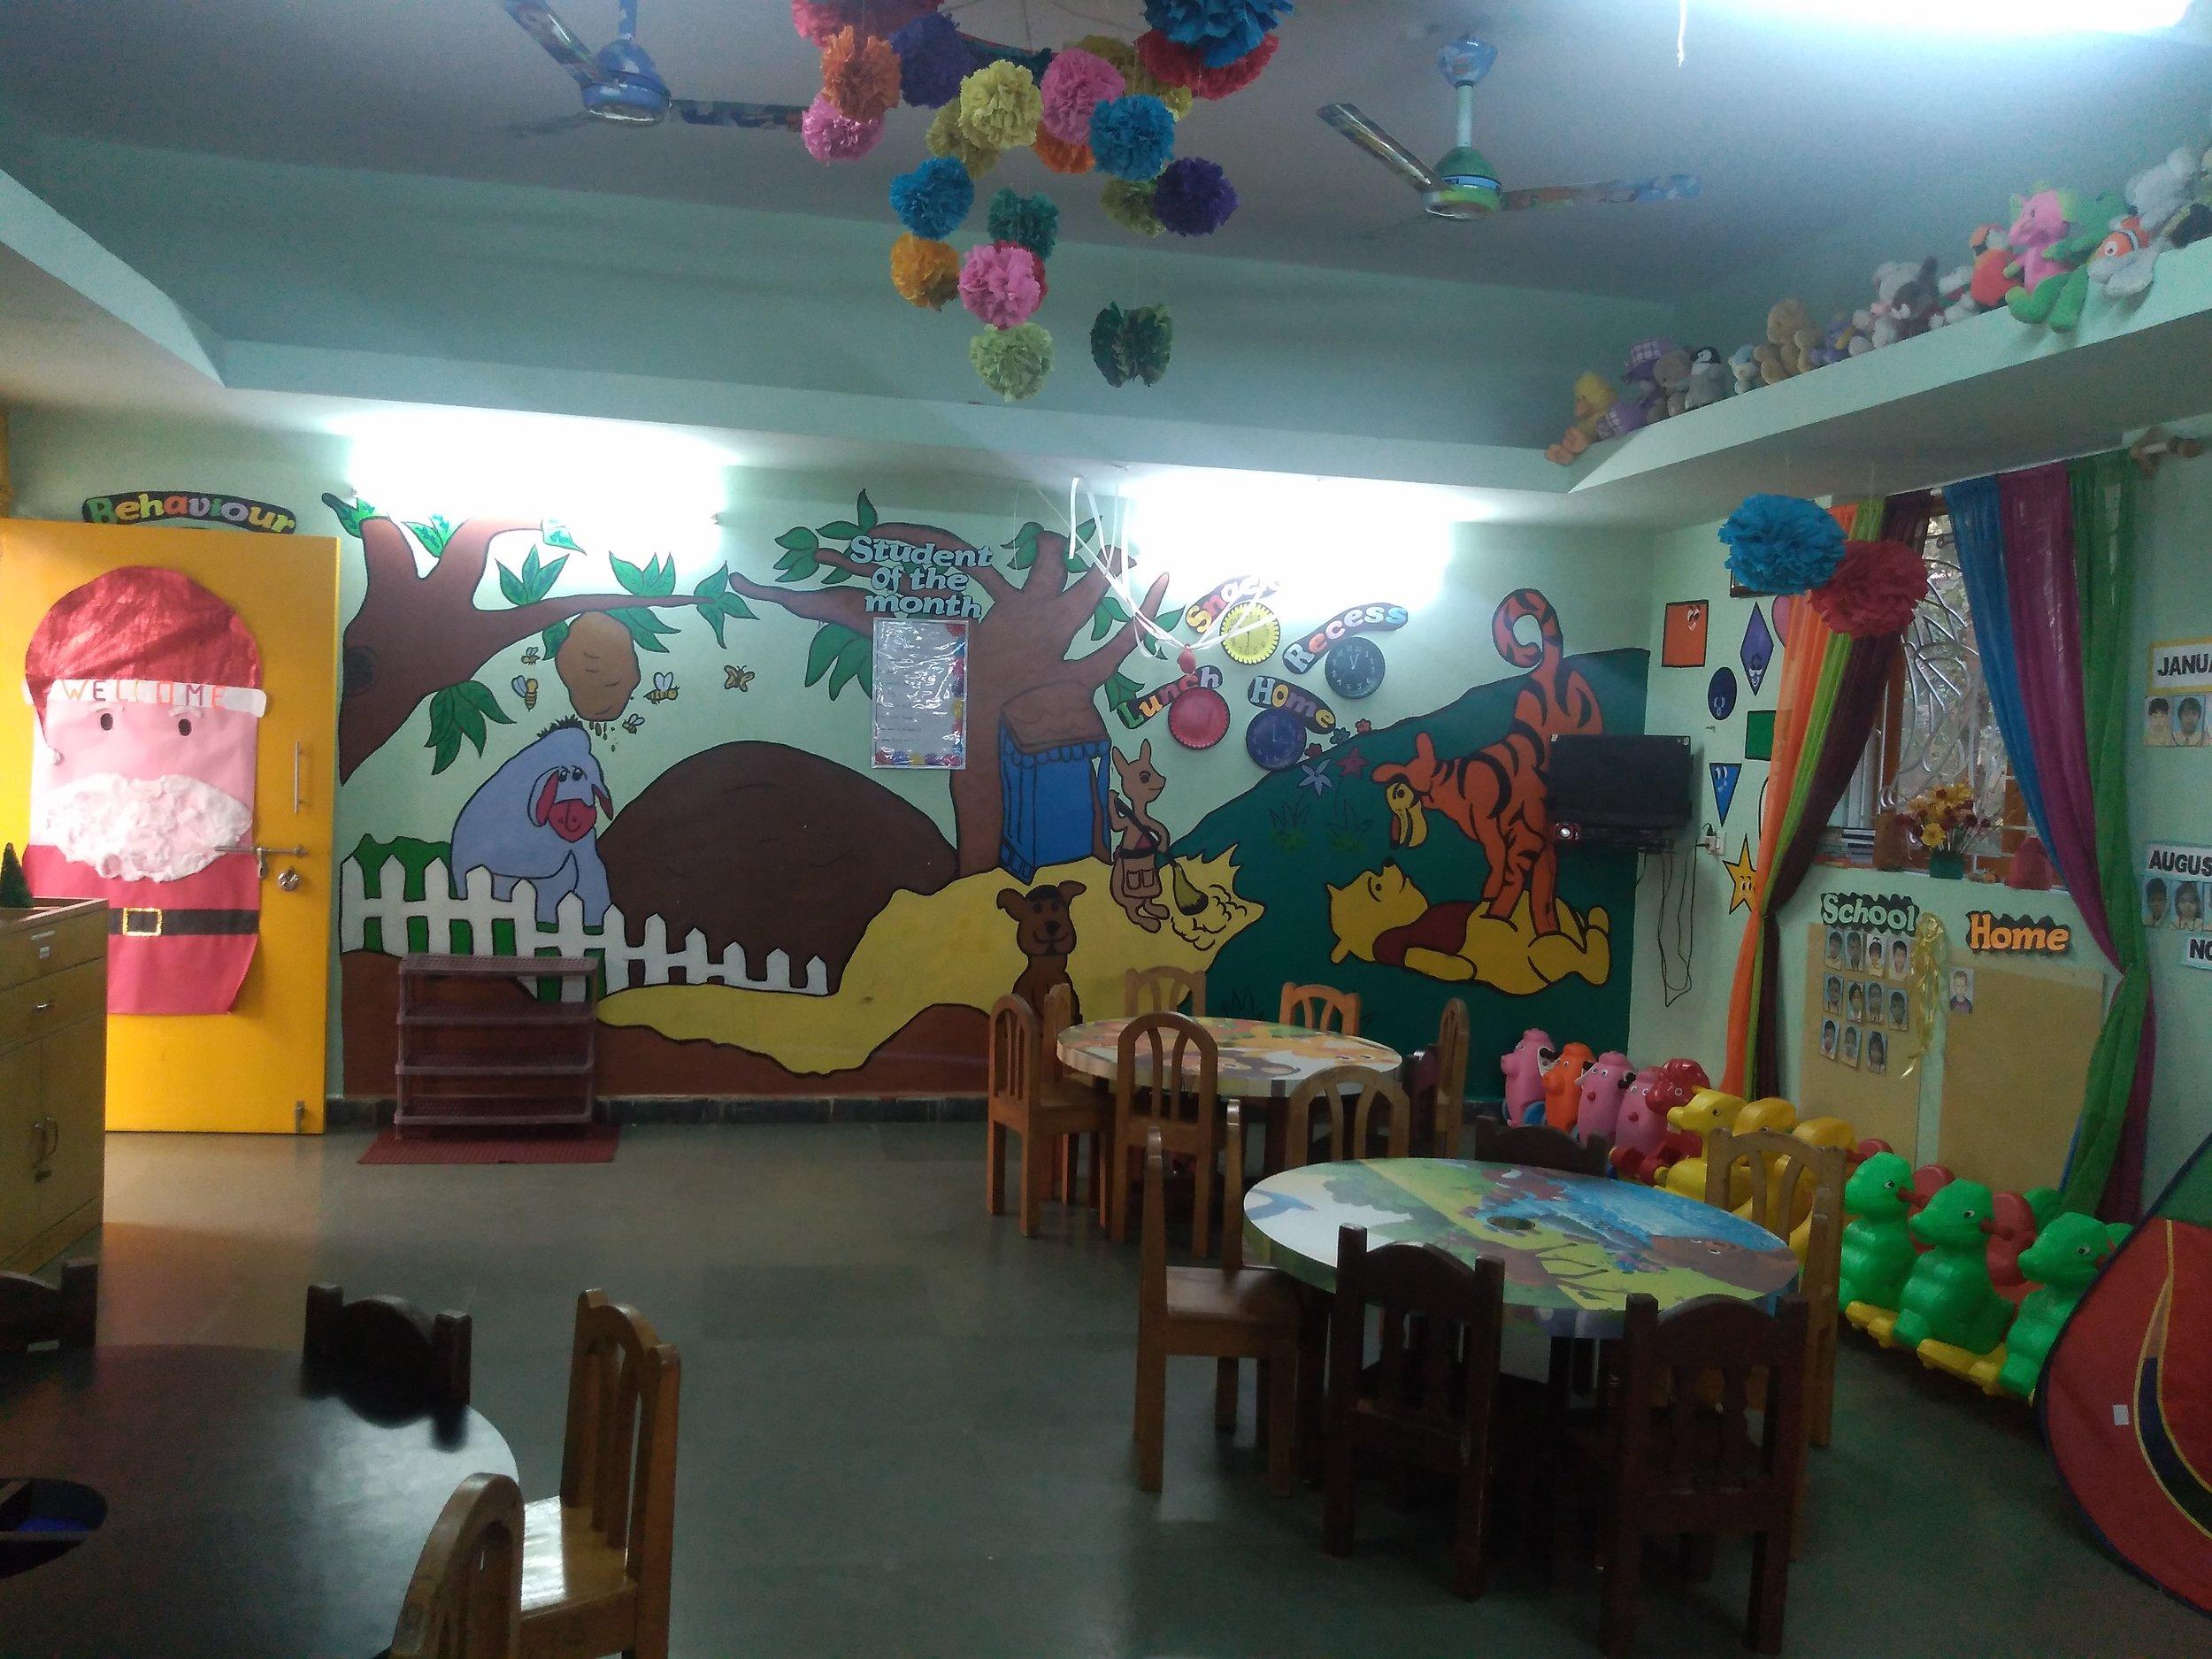 Shanti Niketan School - 11.jpg